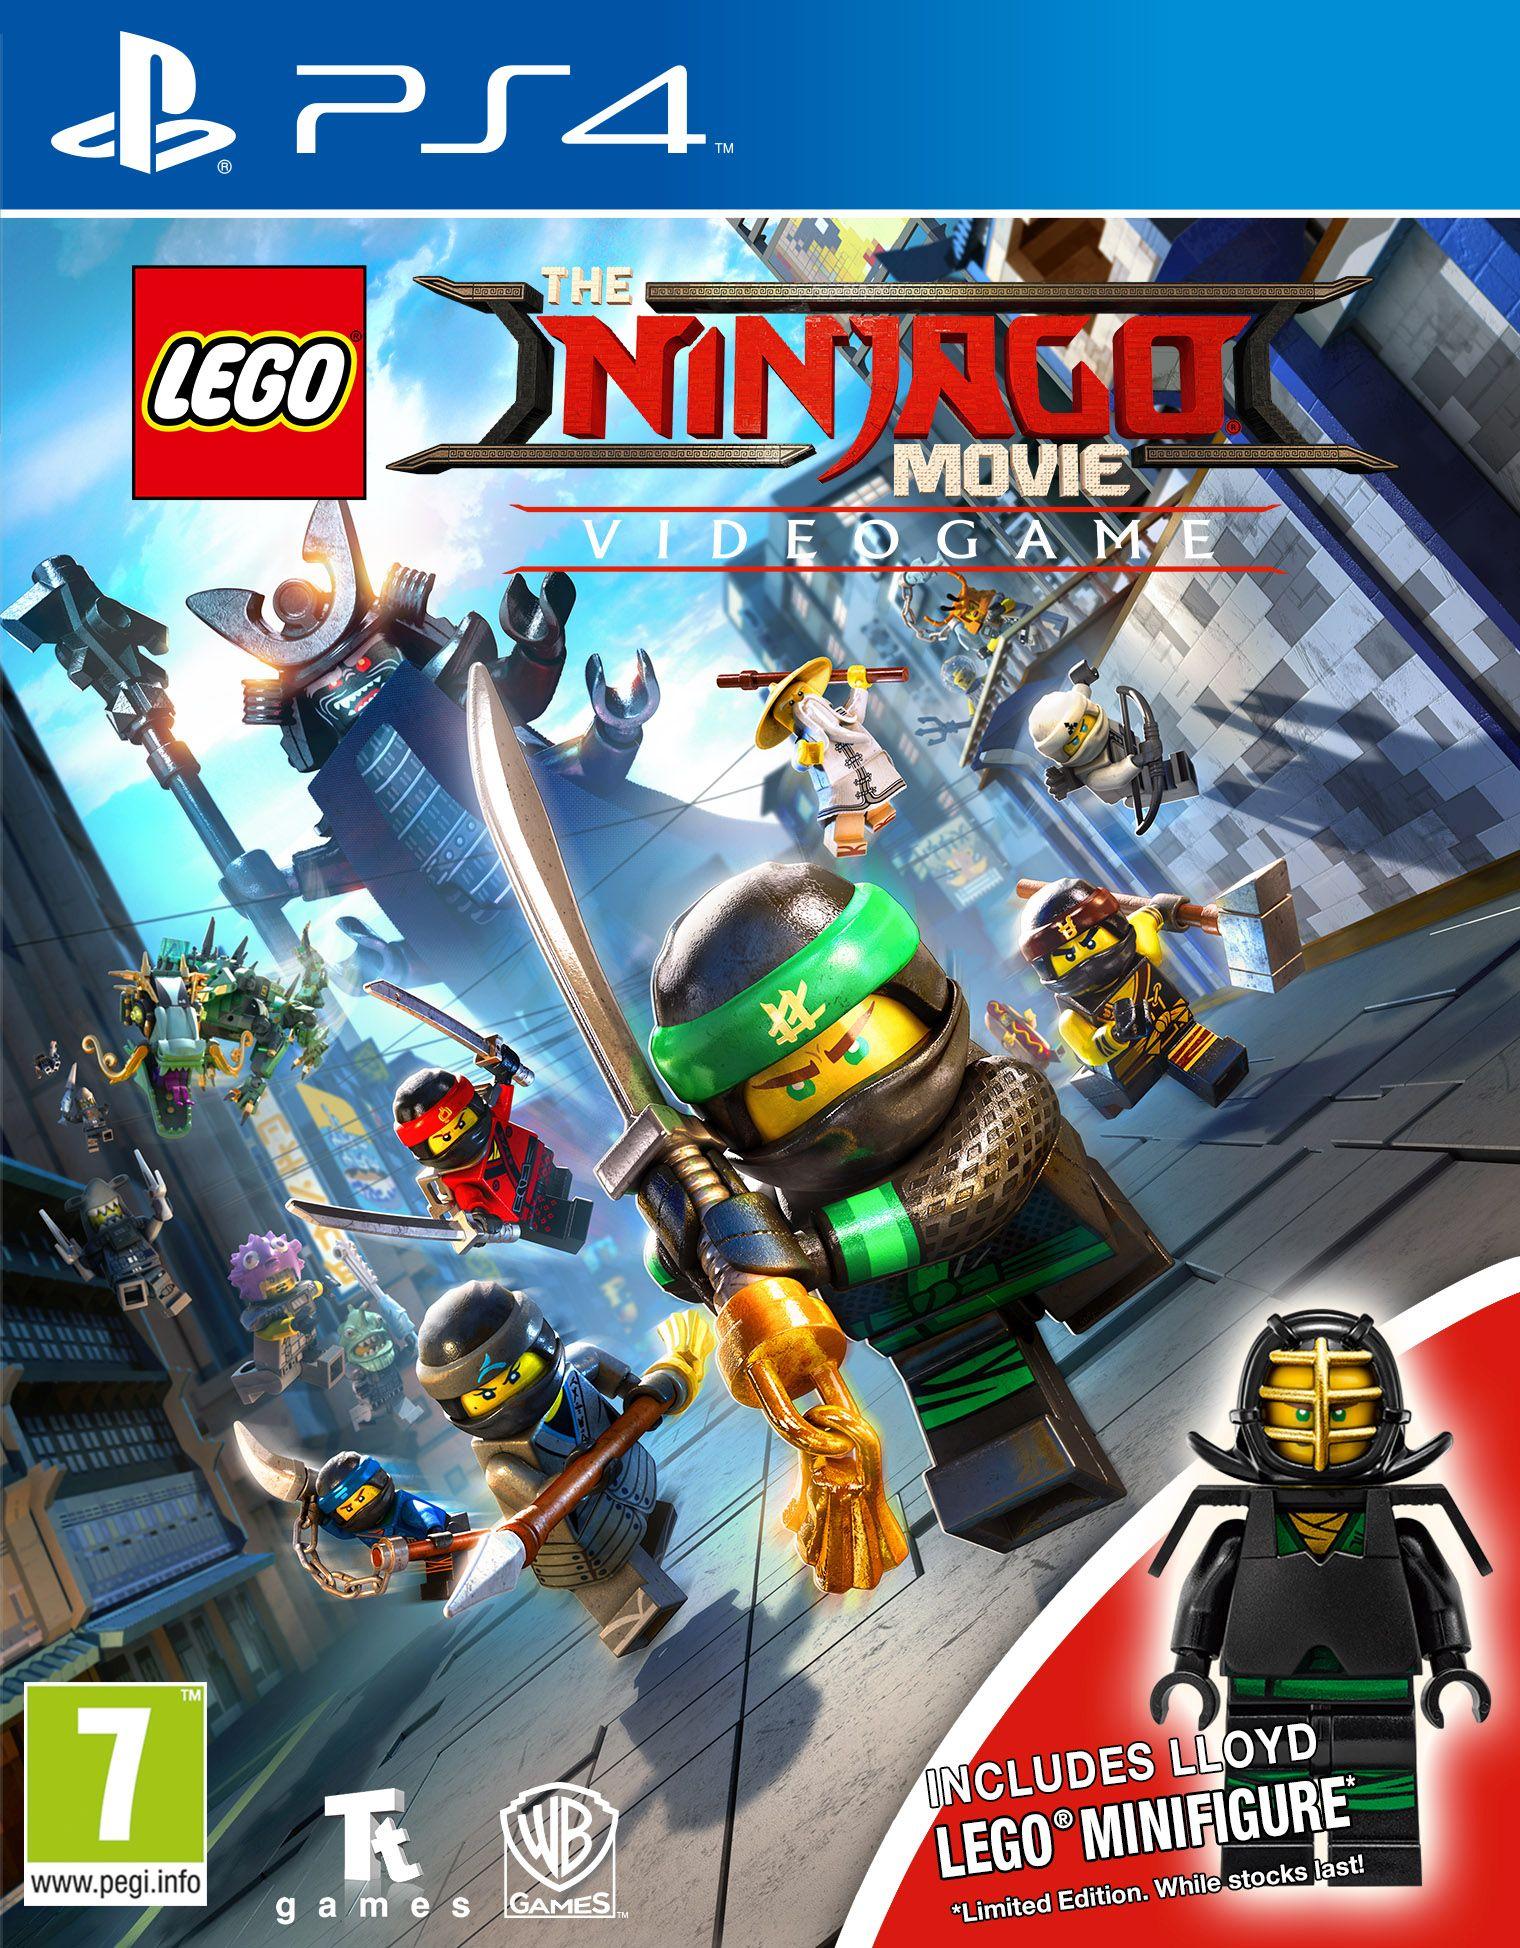 LEGO Ninjago Movie - Gra wideo + minifigurka LLOYD LEGO (PS4) PL - Polski Dubbing + Bonus